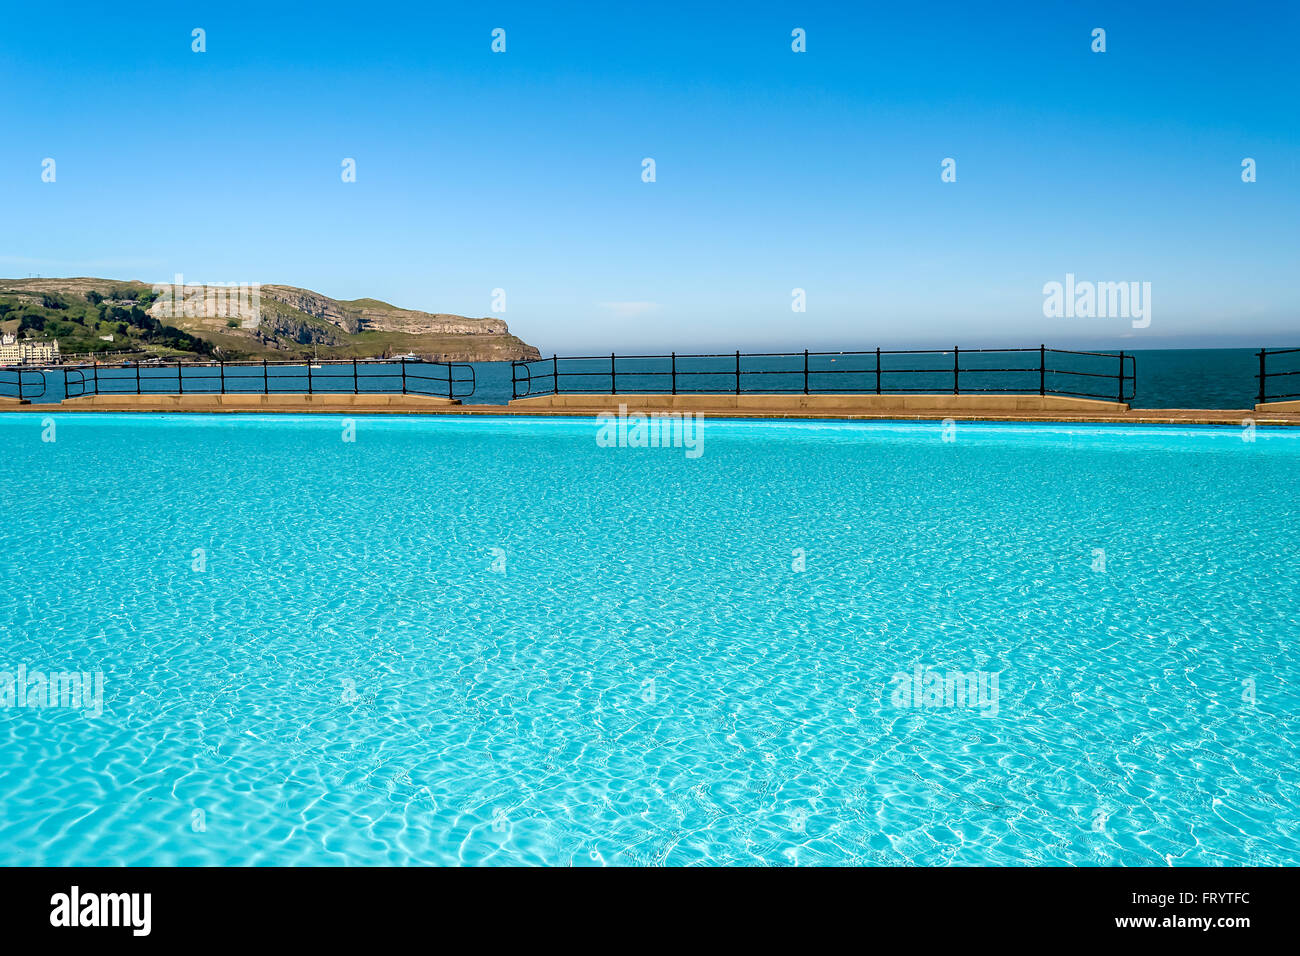 Llandudno Outdoor Swimming Pool Stock Photos Llandudno Outdoor Swimming Pool Stock Images Alamy